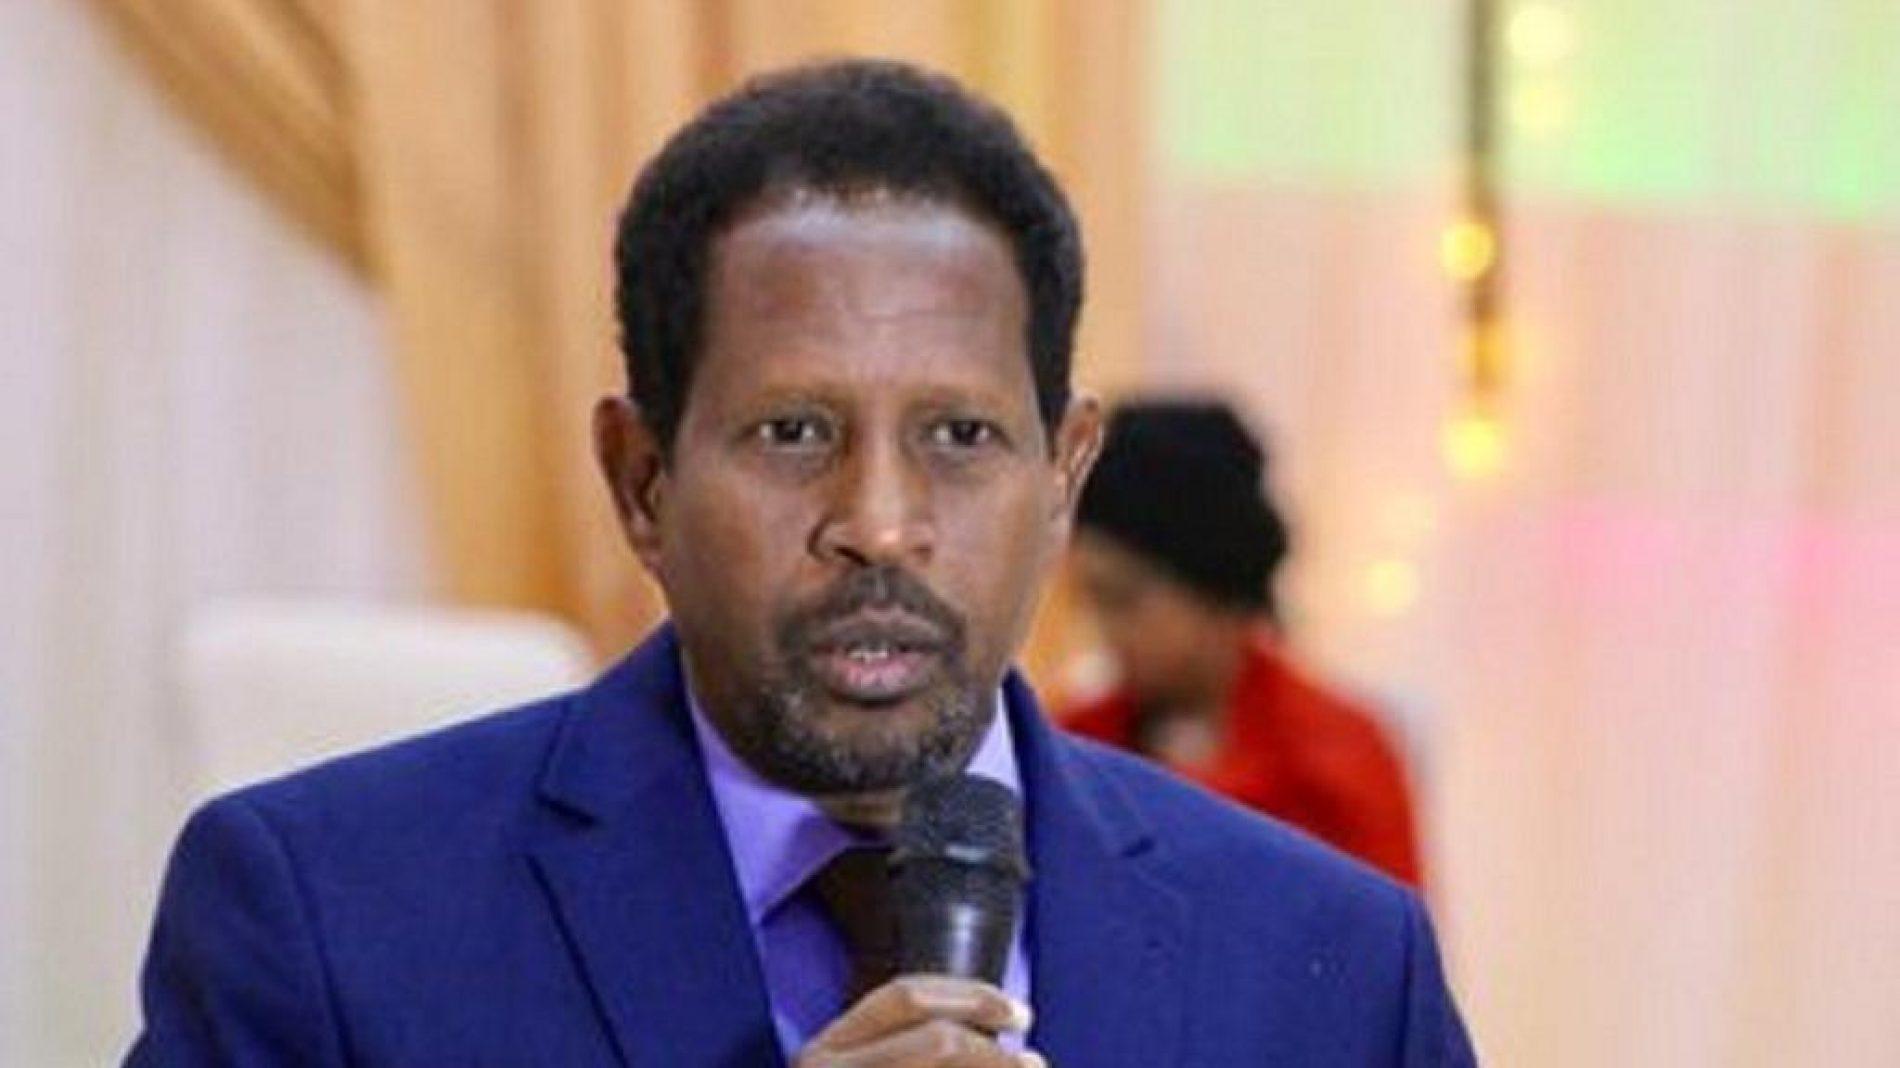 Mairie de Mogadiscio : Six morts enregistrés lors d'une attaque terroriste